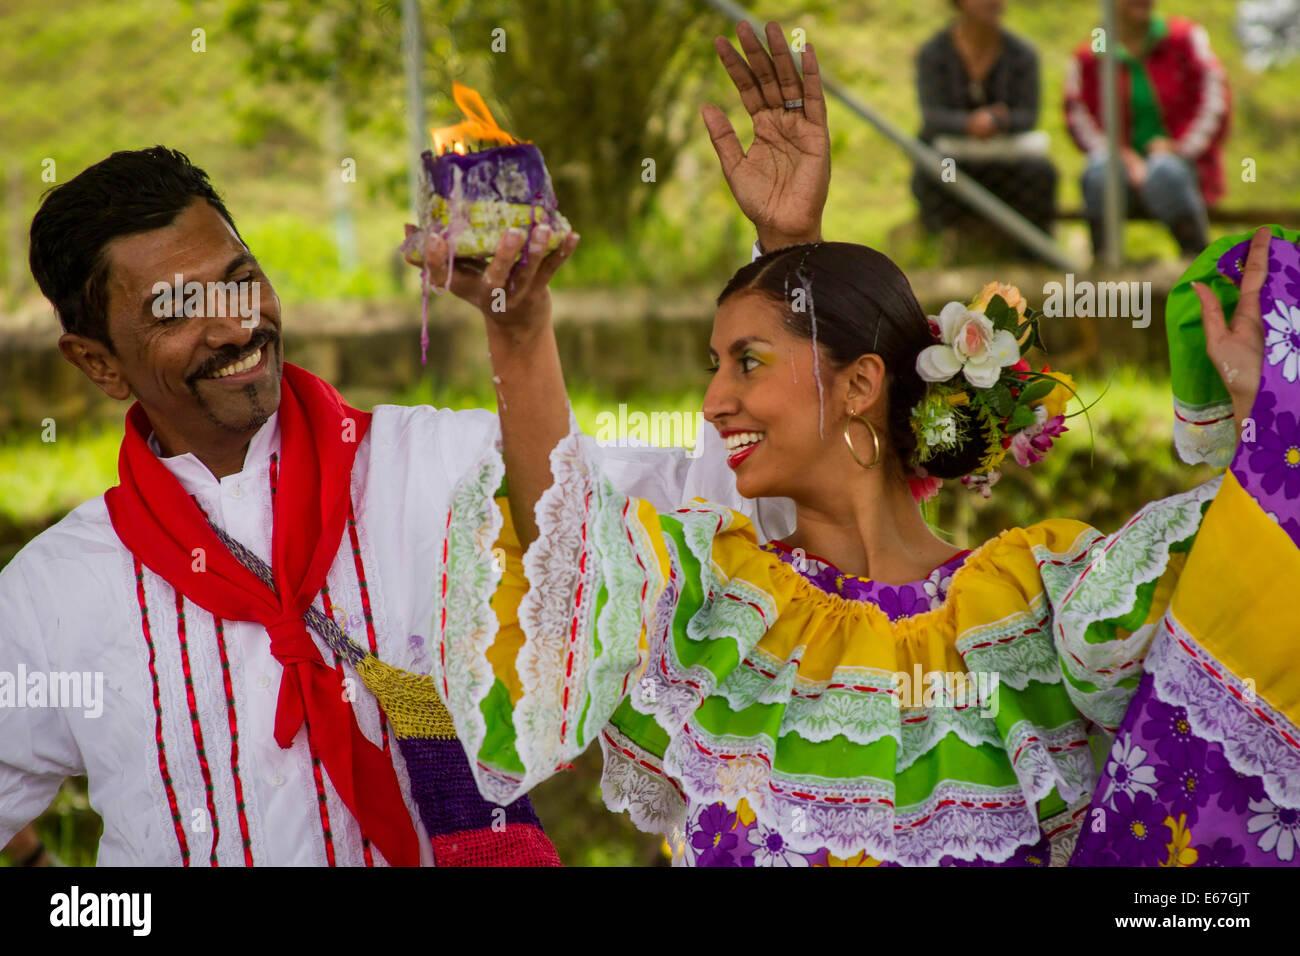 Cumbia Dance - Stock Image